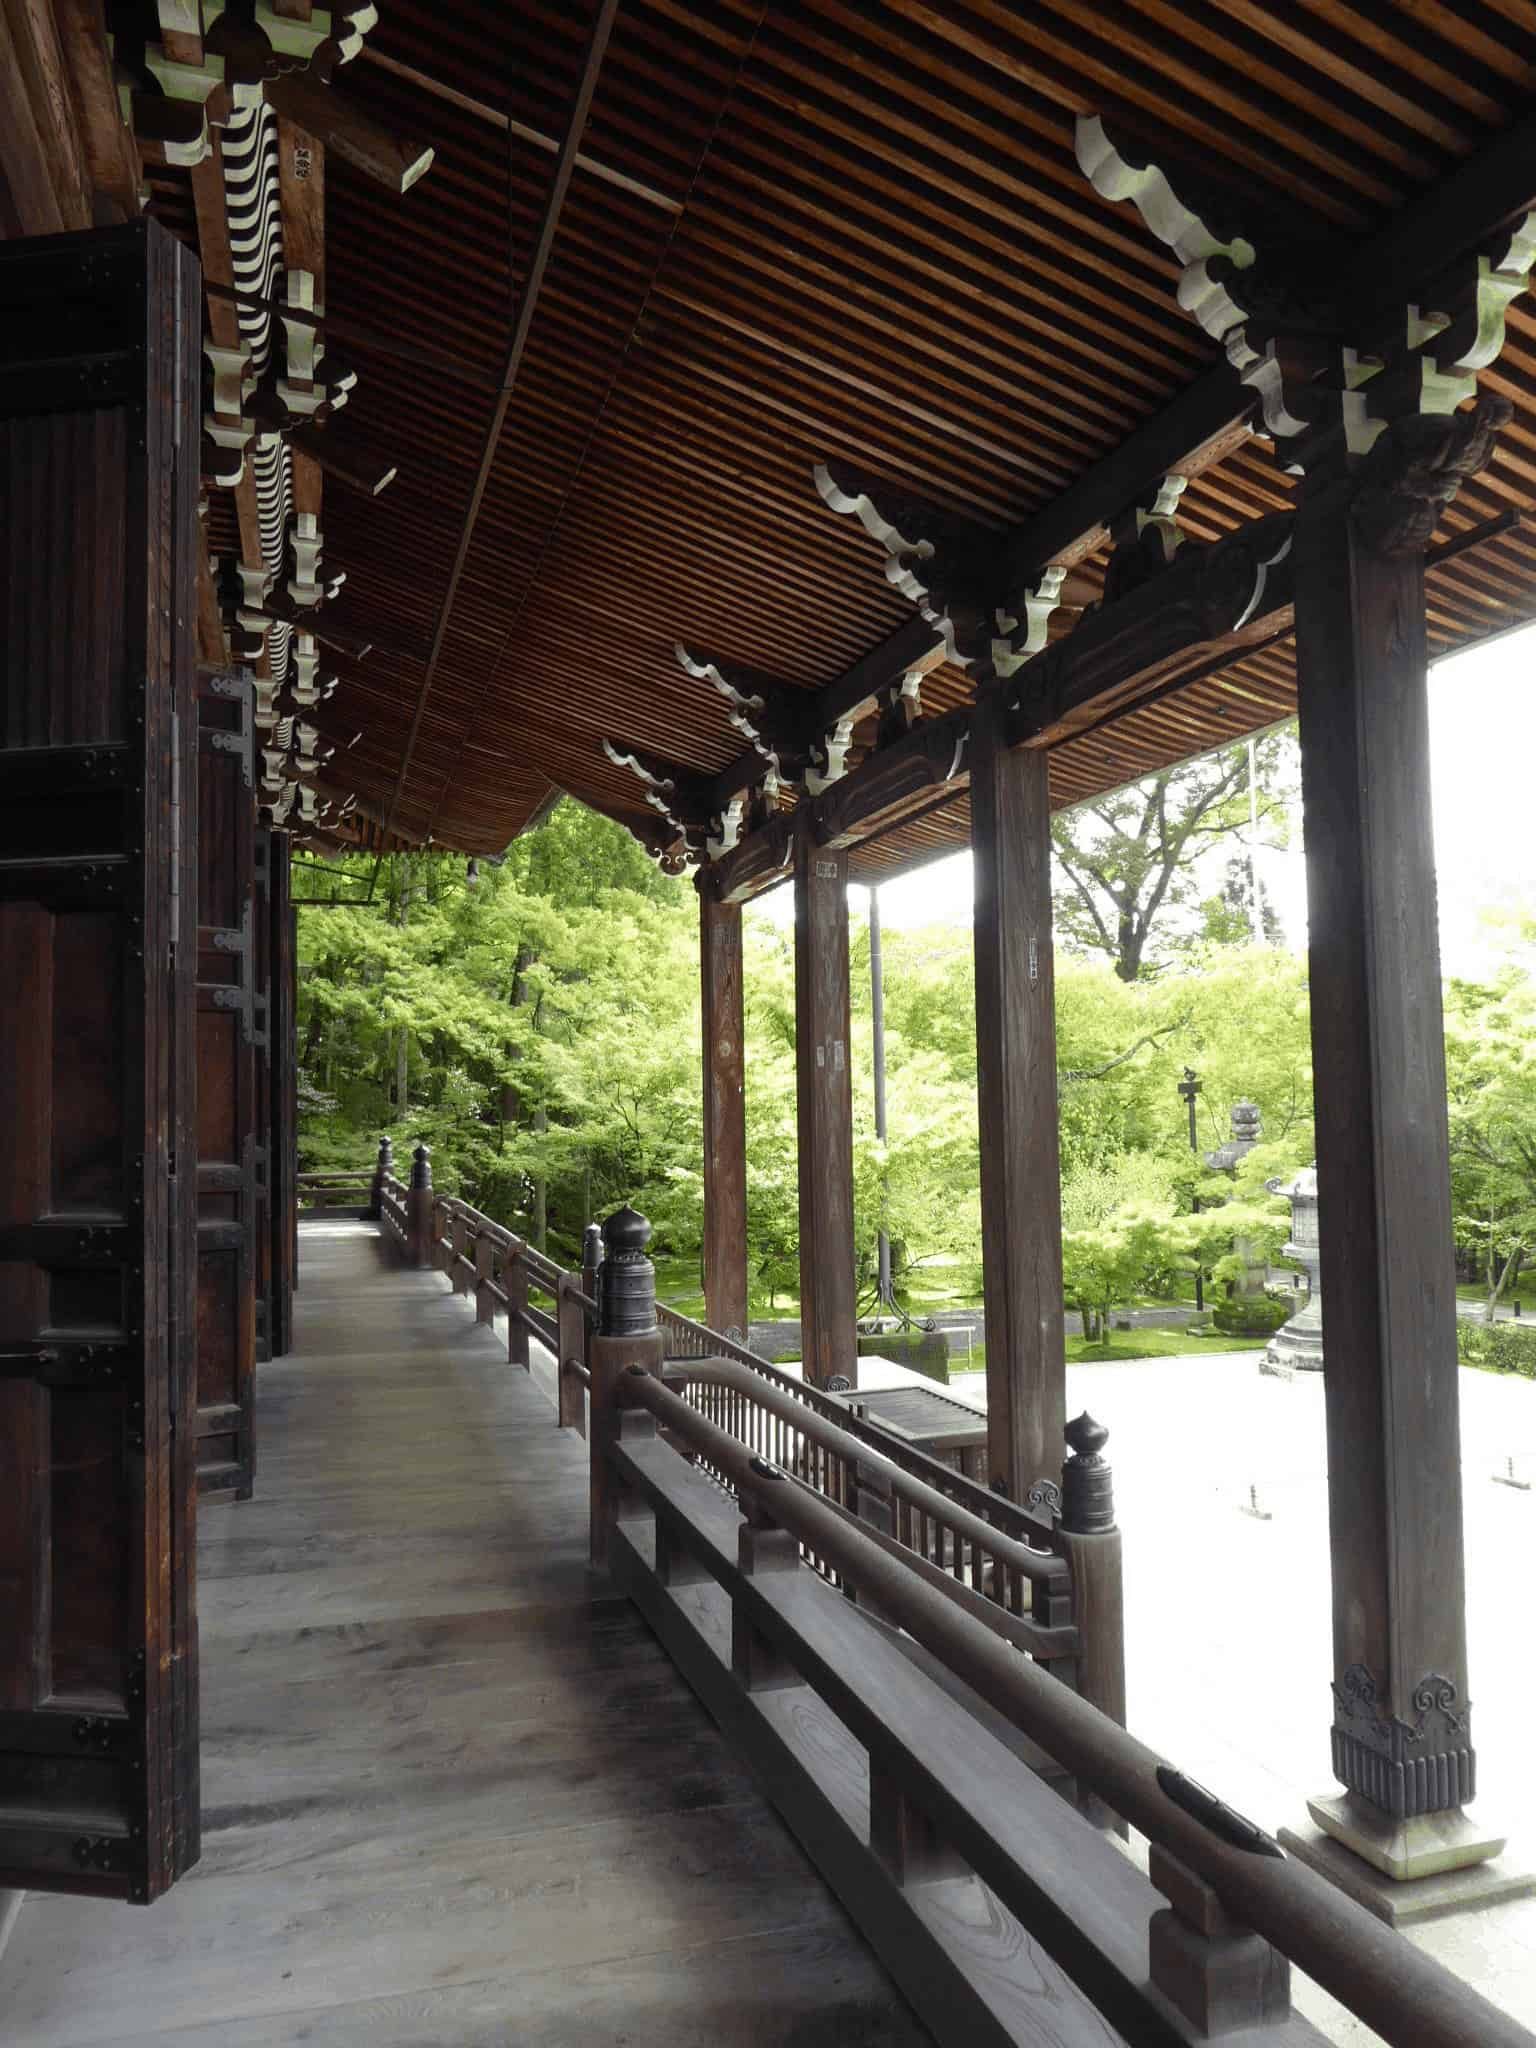 kyoto_essential_Philosopherspath_Point14_EIKANDO